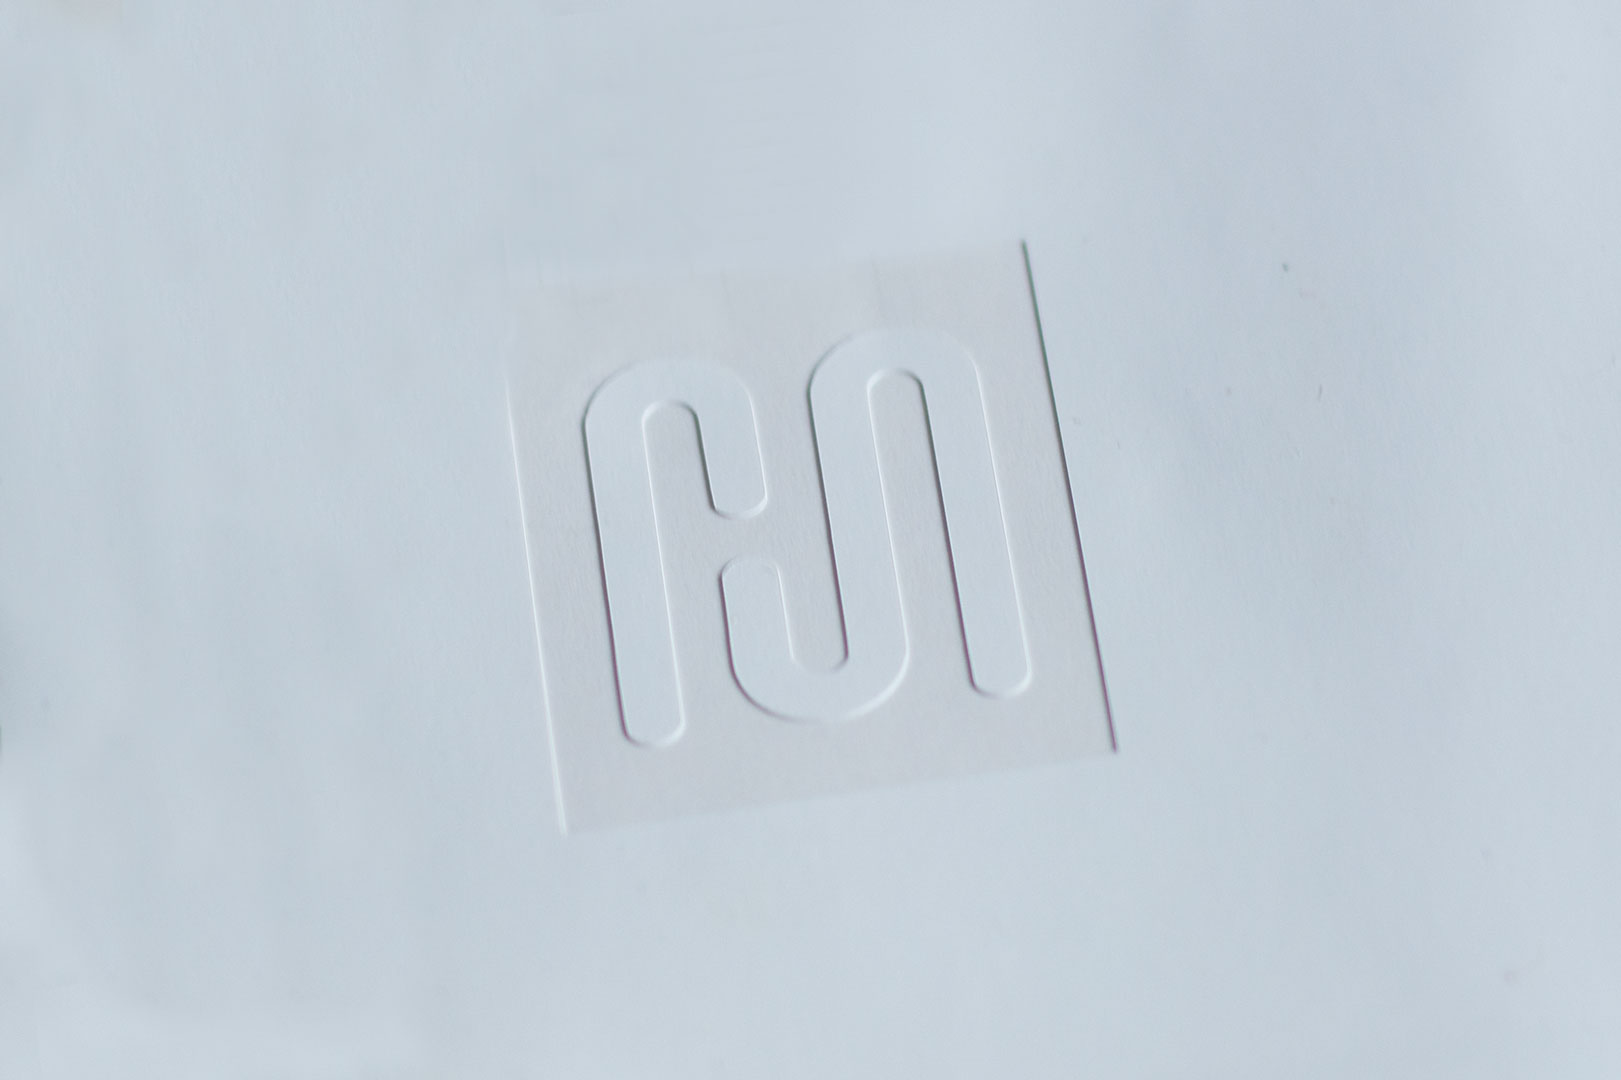 Mini Mods: Add Your Own Logo to a Corsair Hydro Series AIO